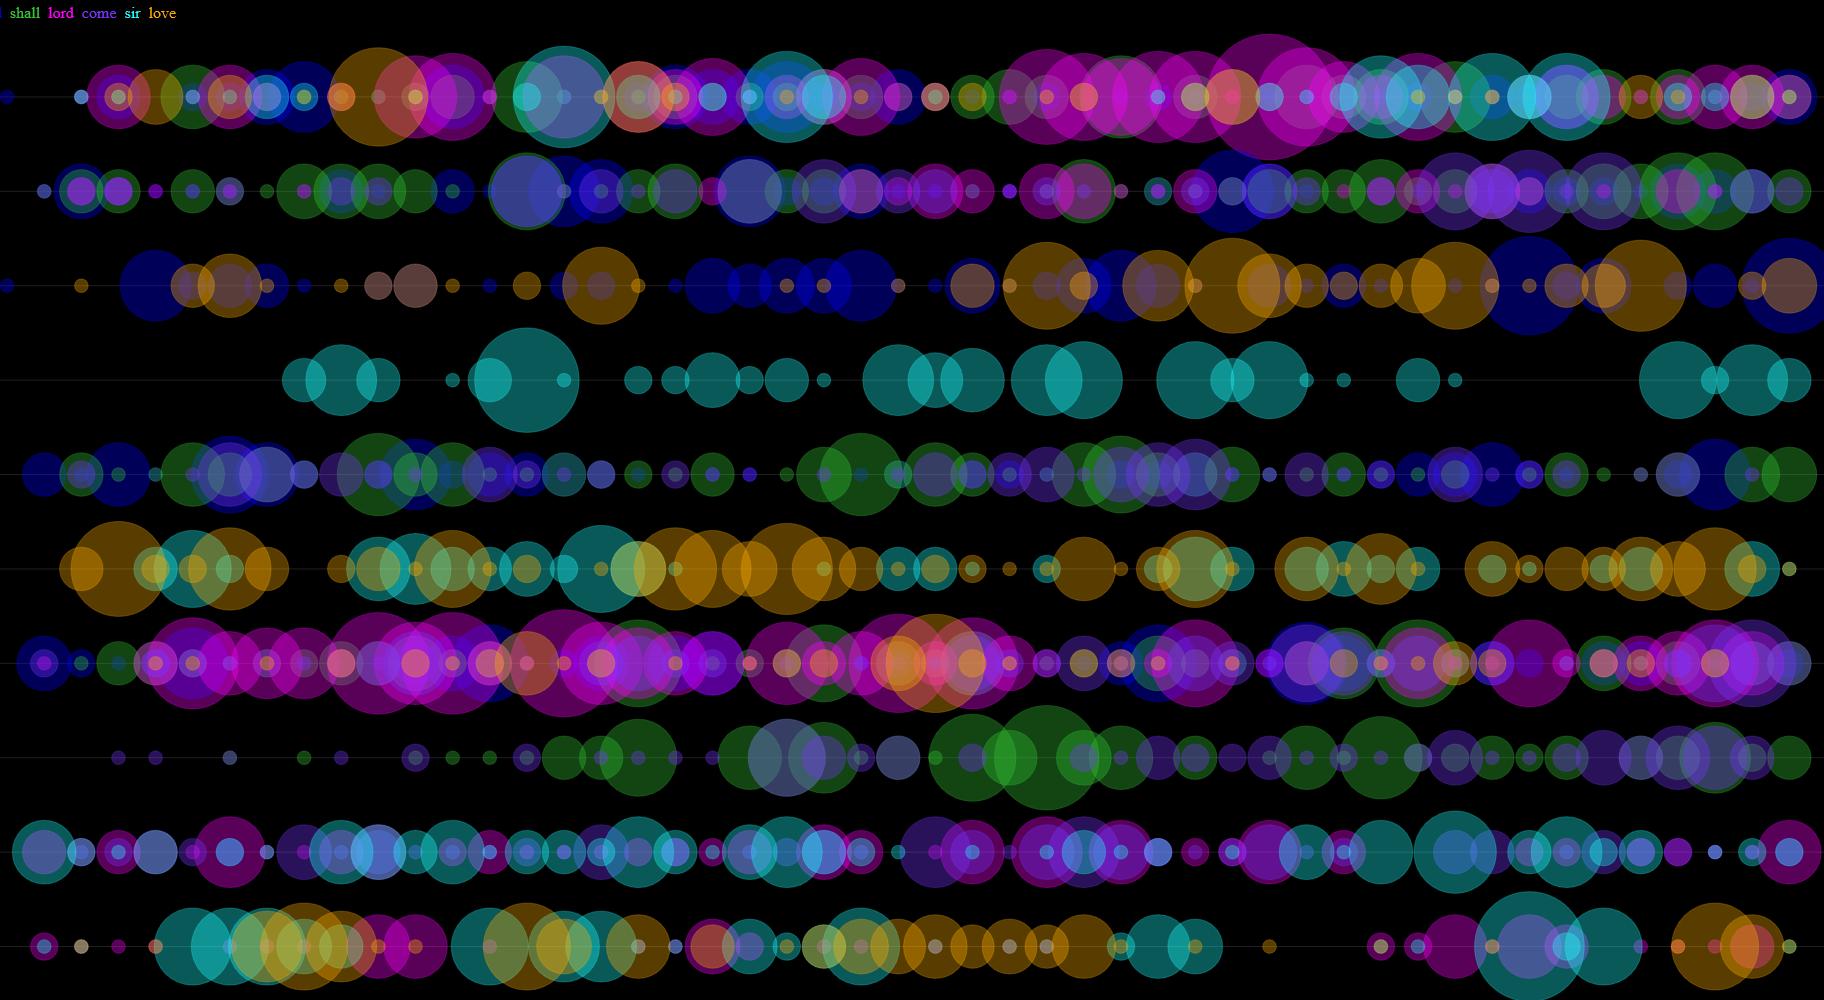 visualizing text.jpeg